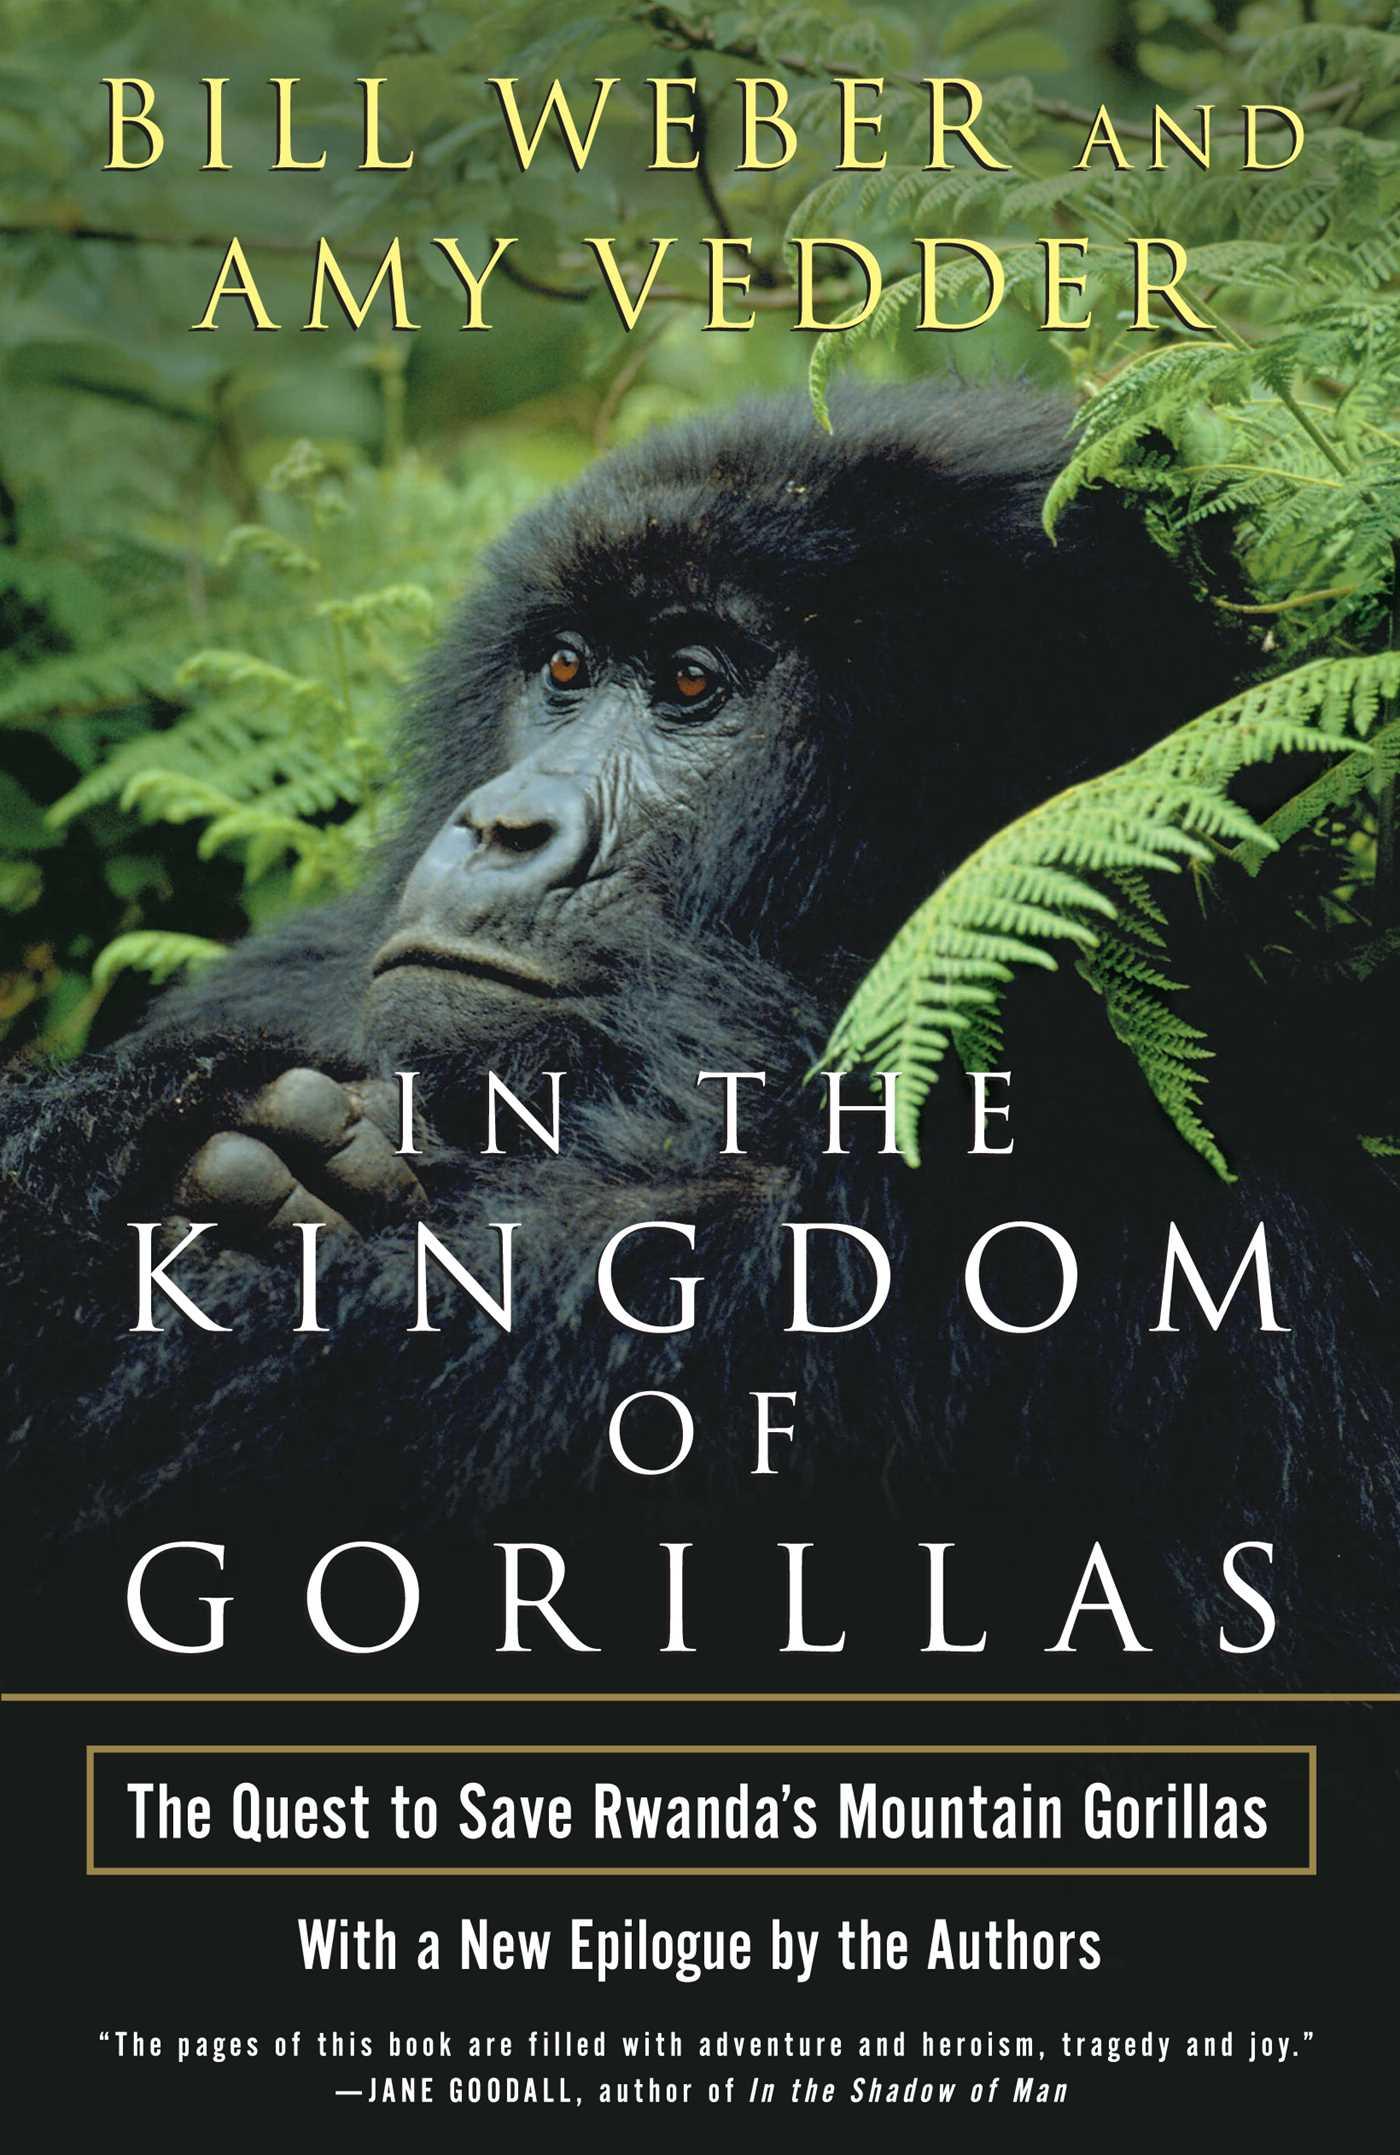 In the kingdom of gorillas 9781439128534 hr